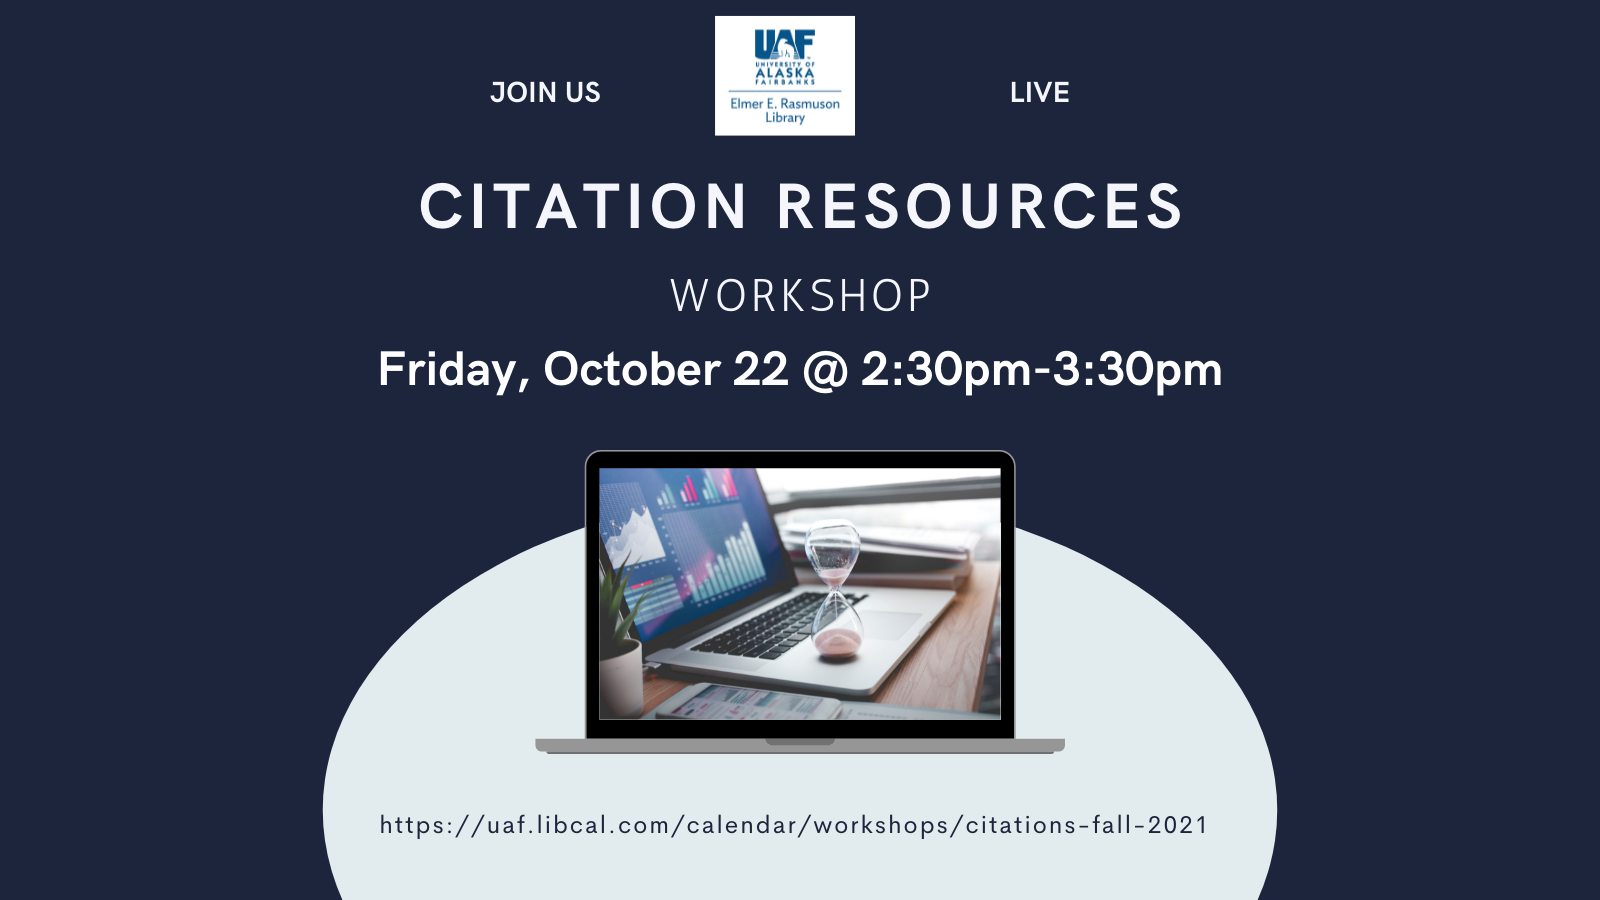 Citation Resources Workshop Oct. 22 starting at 2:30pm